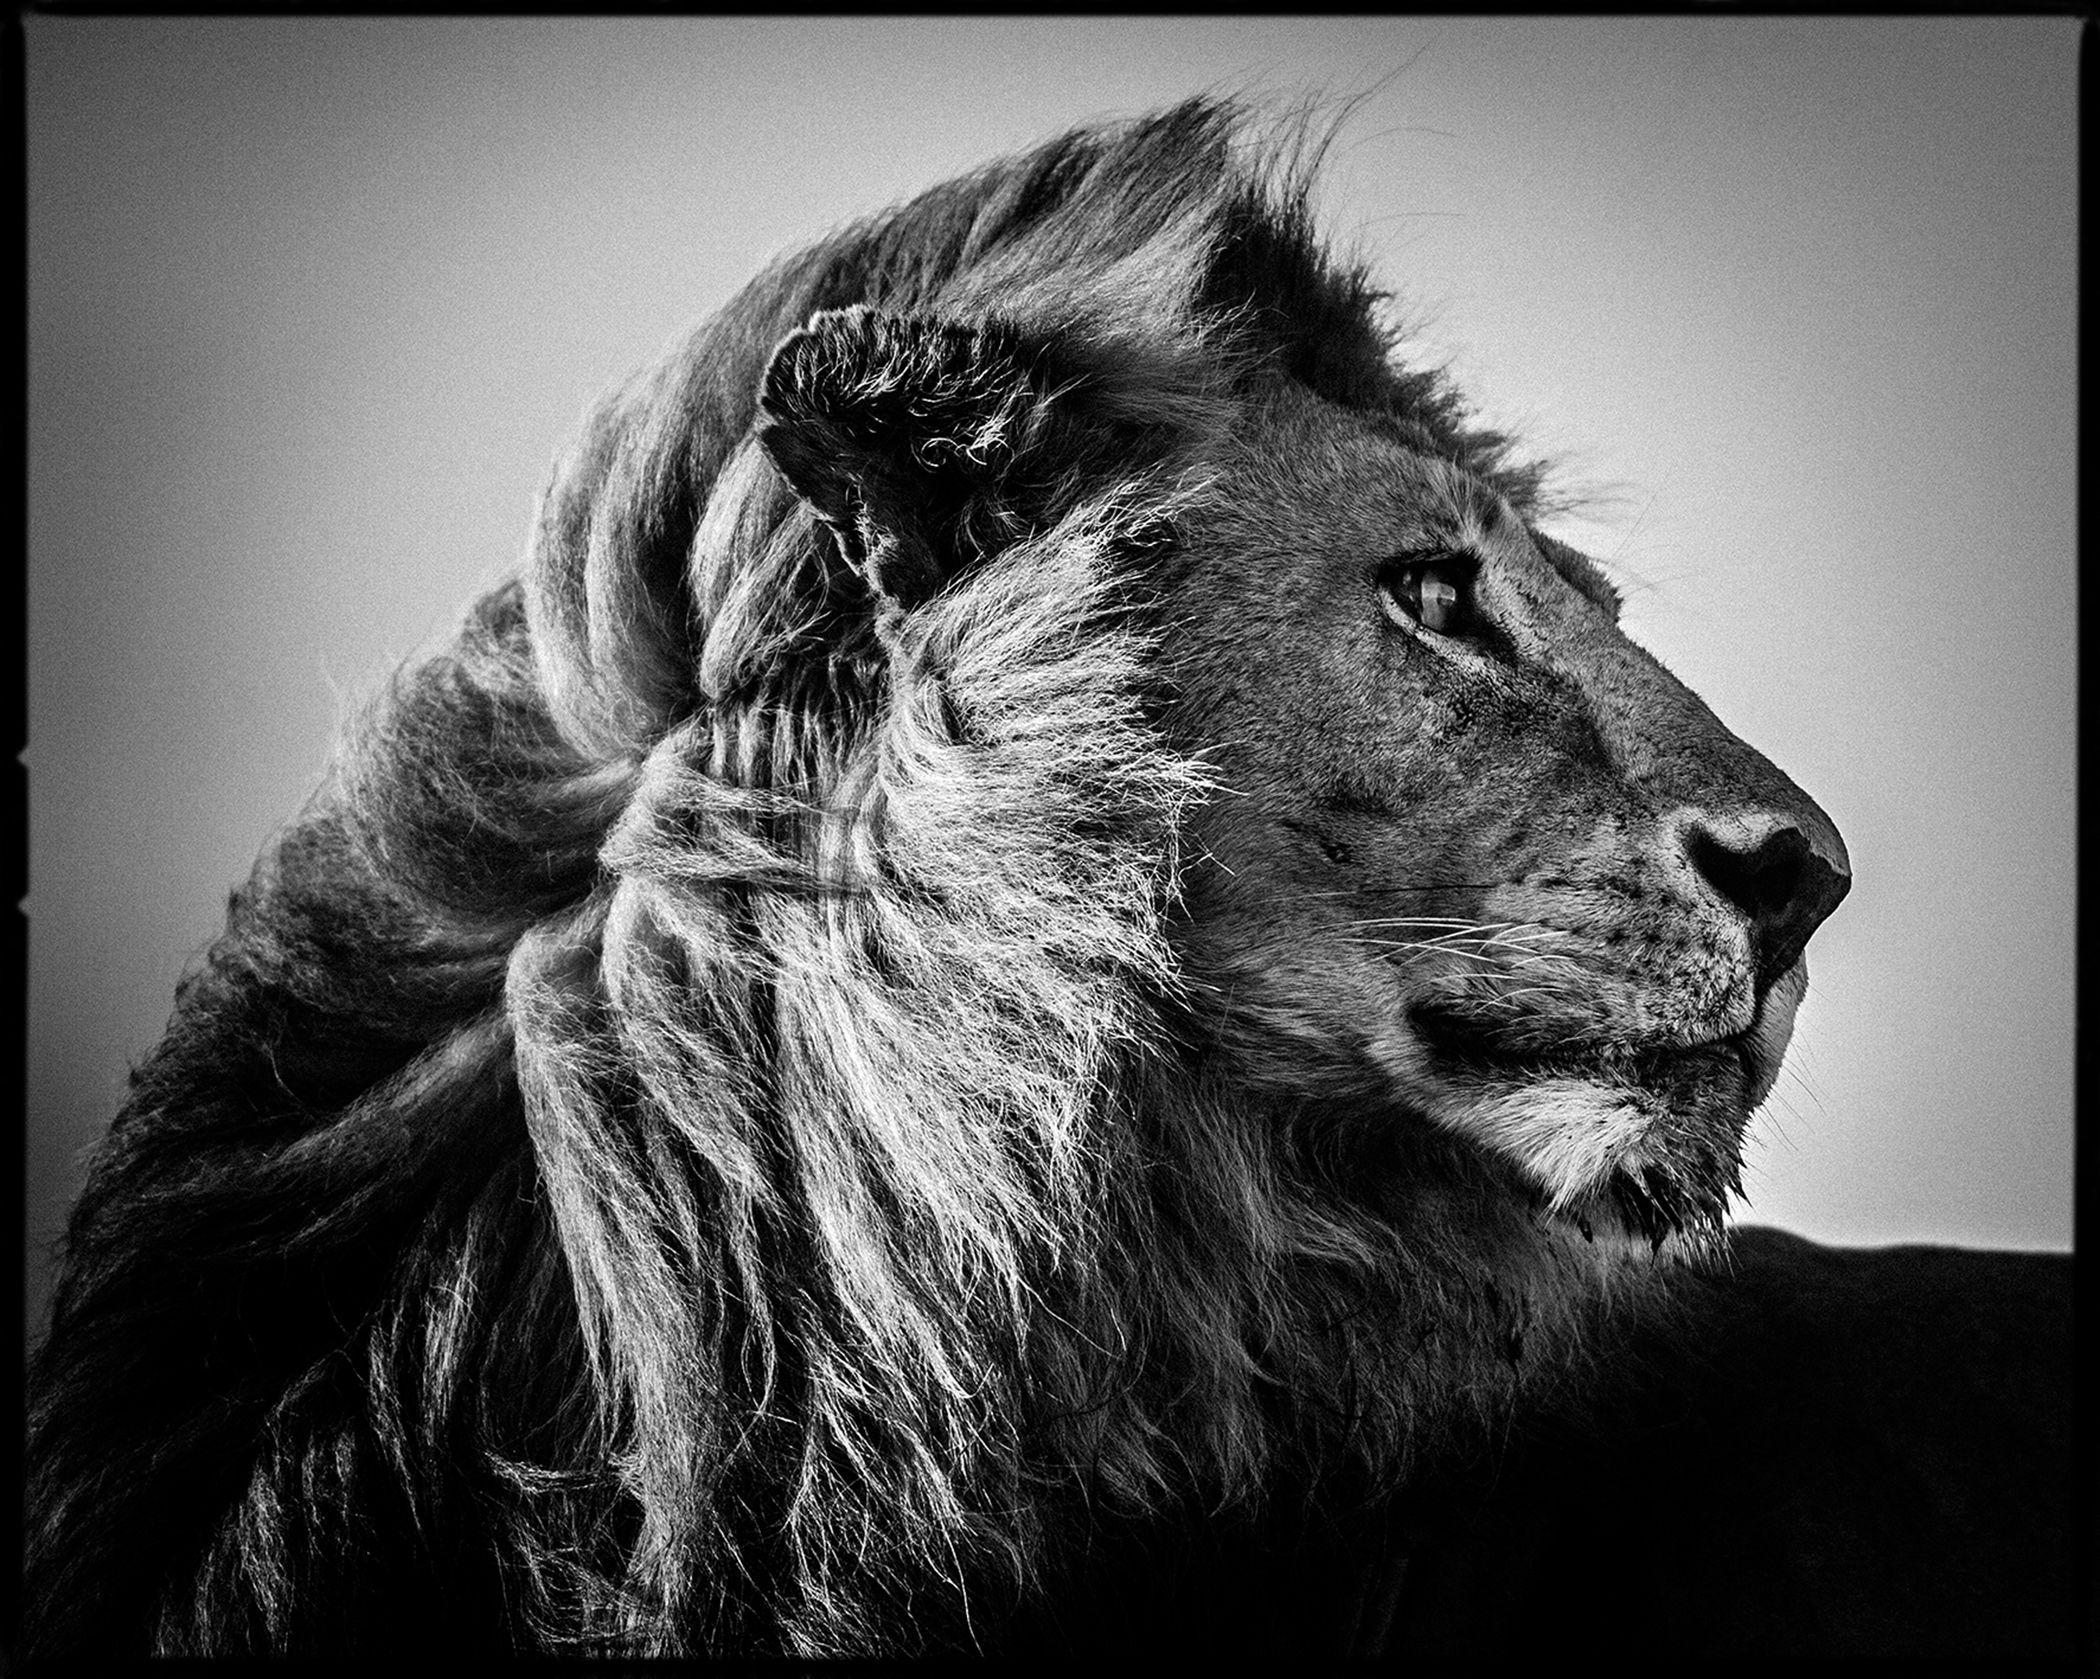 lion in the wind 3 laurent baheux photos tableaux. Black Bedroom Furniture Sets. Home Design Ideas